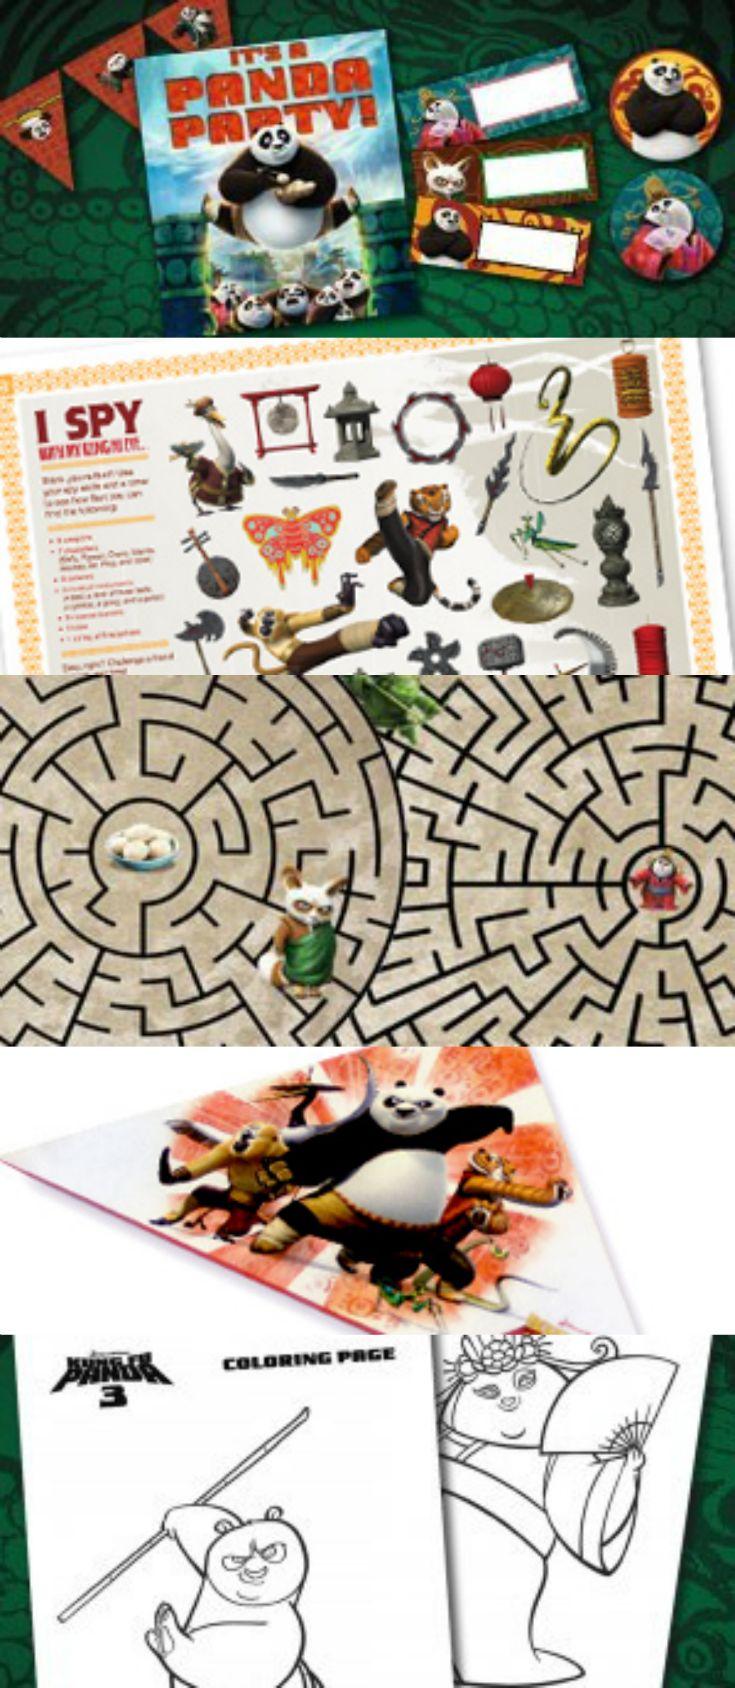 Free coloring pages kung fu panda - 4 Reasons To See Kung Fu Panda 3 And Free Printable Kids Activities Party Ideas